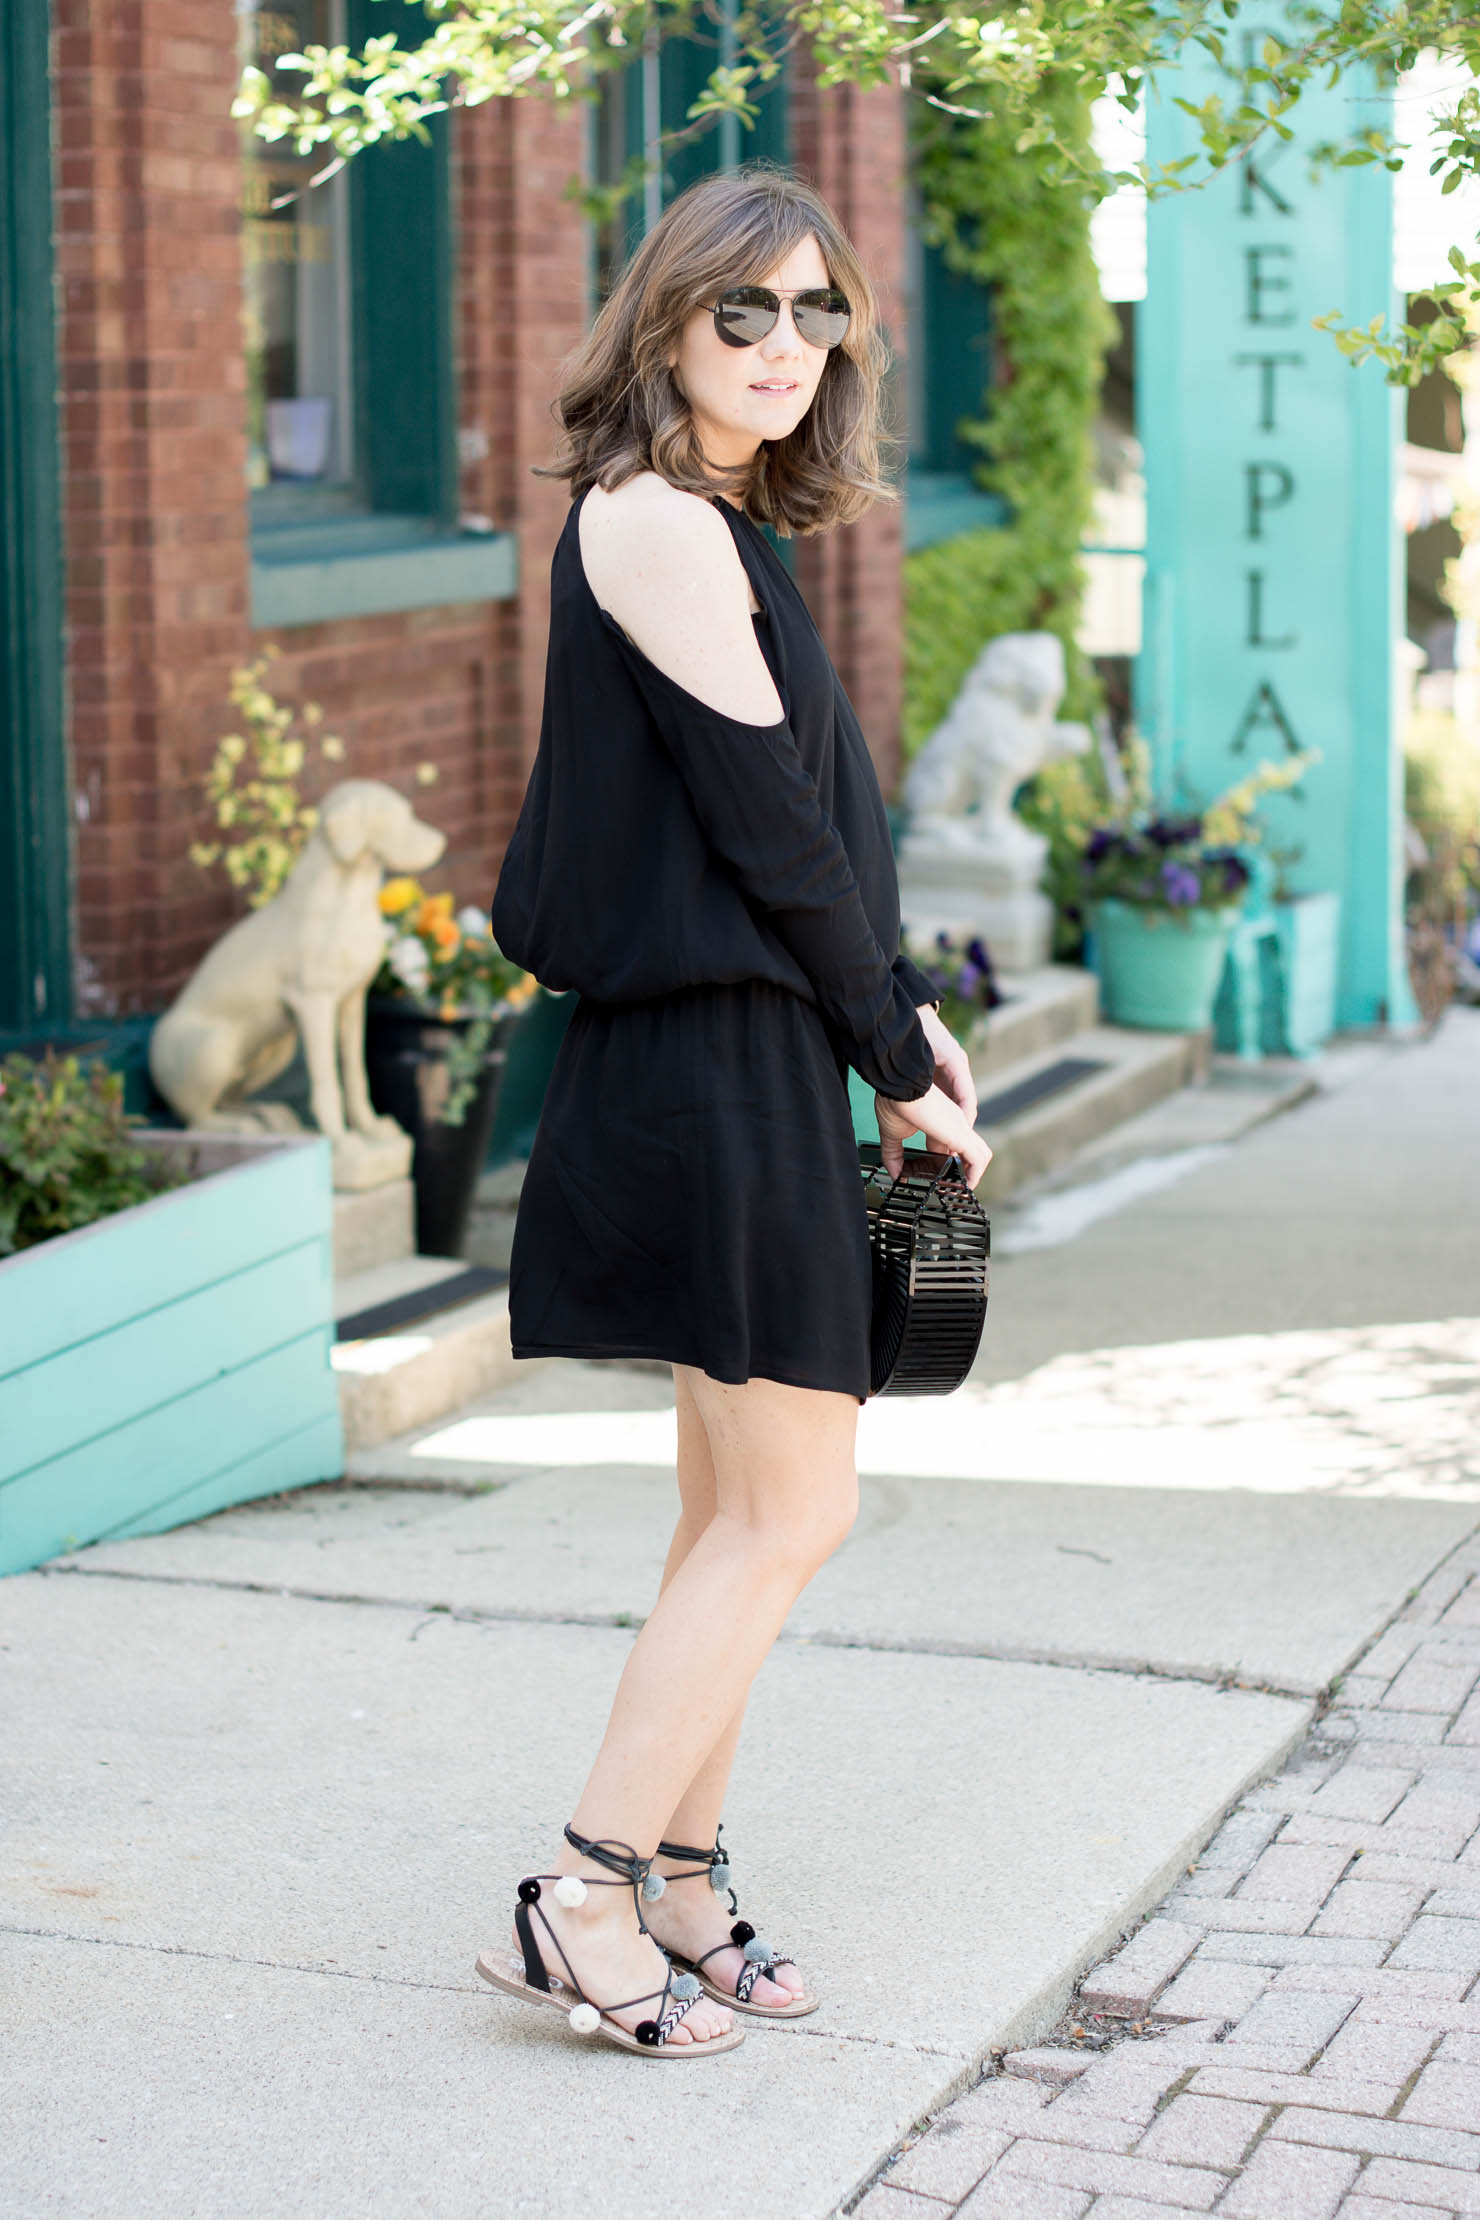 tobi cold shoulder open back summer dresses, black cult gaia, clutch summer date night outfit, pompom sandals under $30, festival style